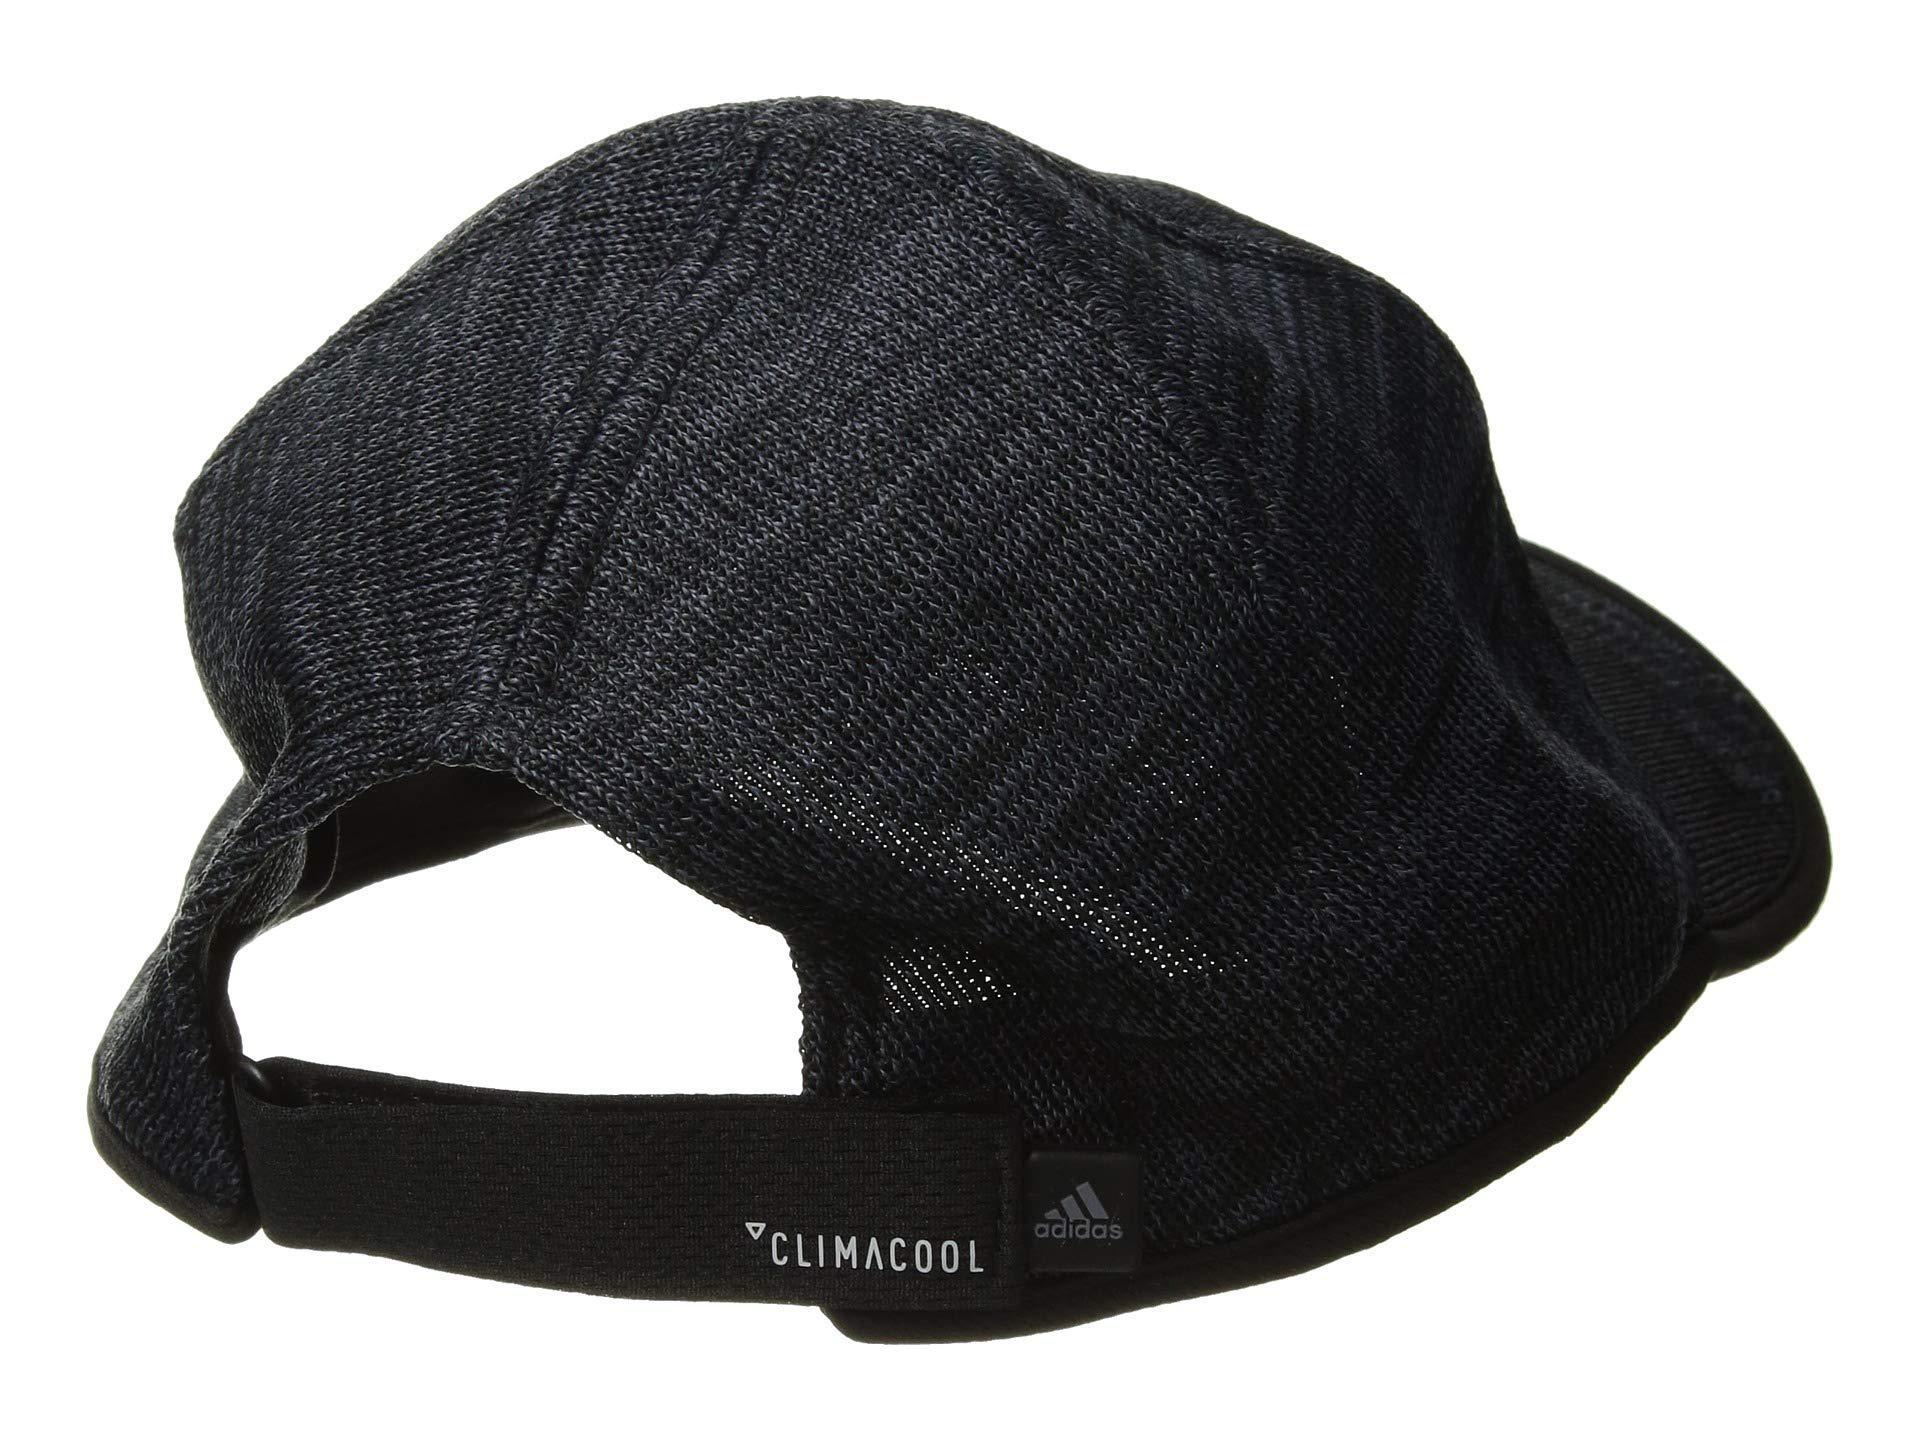 75126e6ac0689 Adidas - Black Superlite Prime Ii Cap (white clear Grey) Caps for Men. View  fullscreen